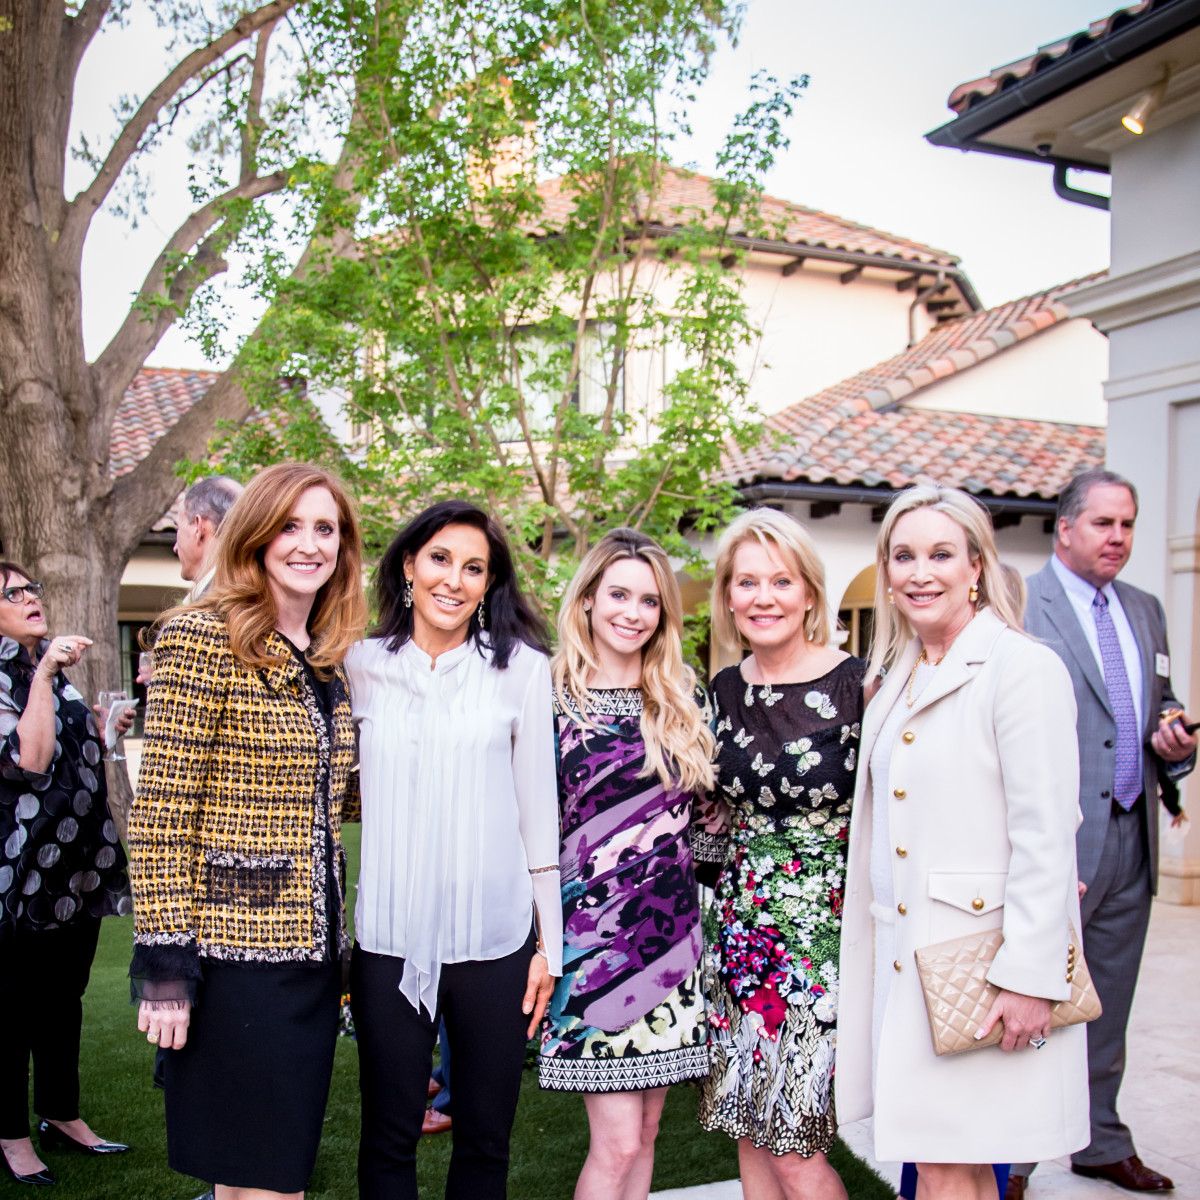 Tiffany Divis, Rhonda Marcus, Nicole Stephenson, Lisa Genecov, Kim Hext